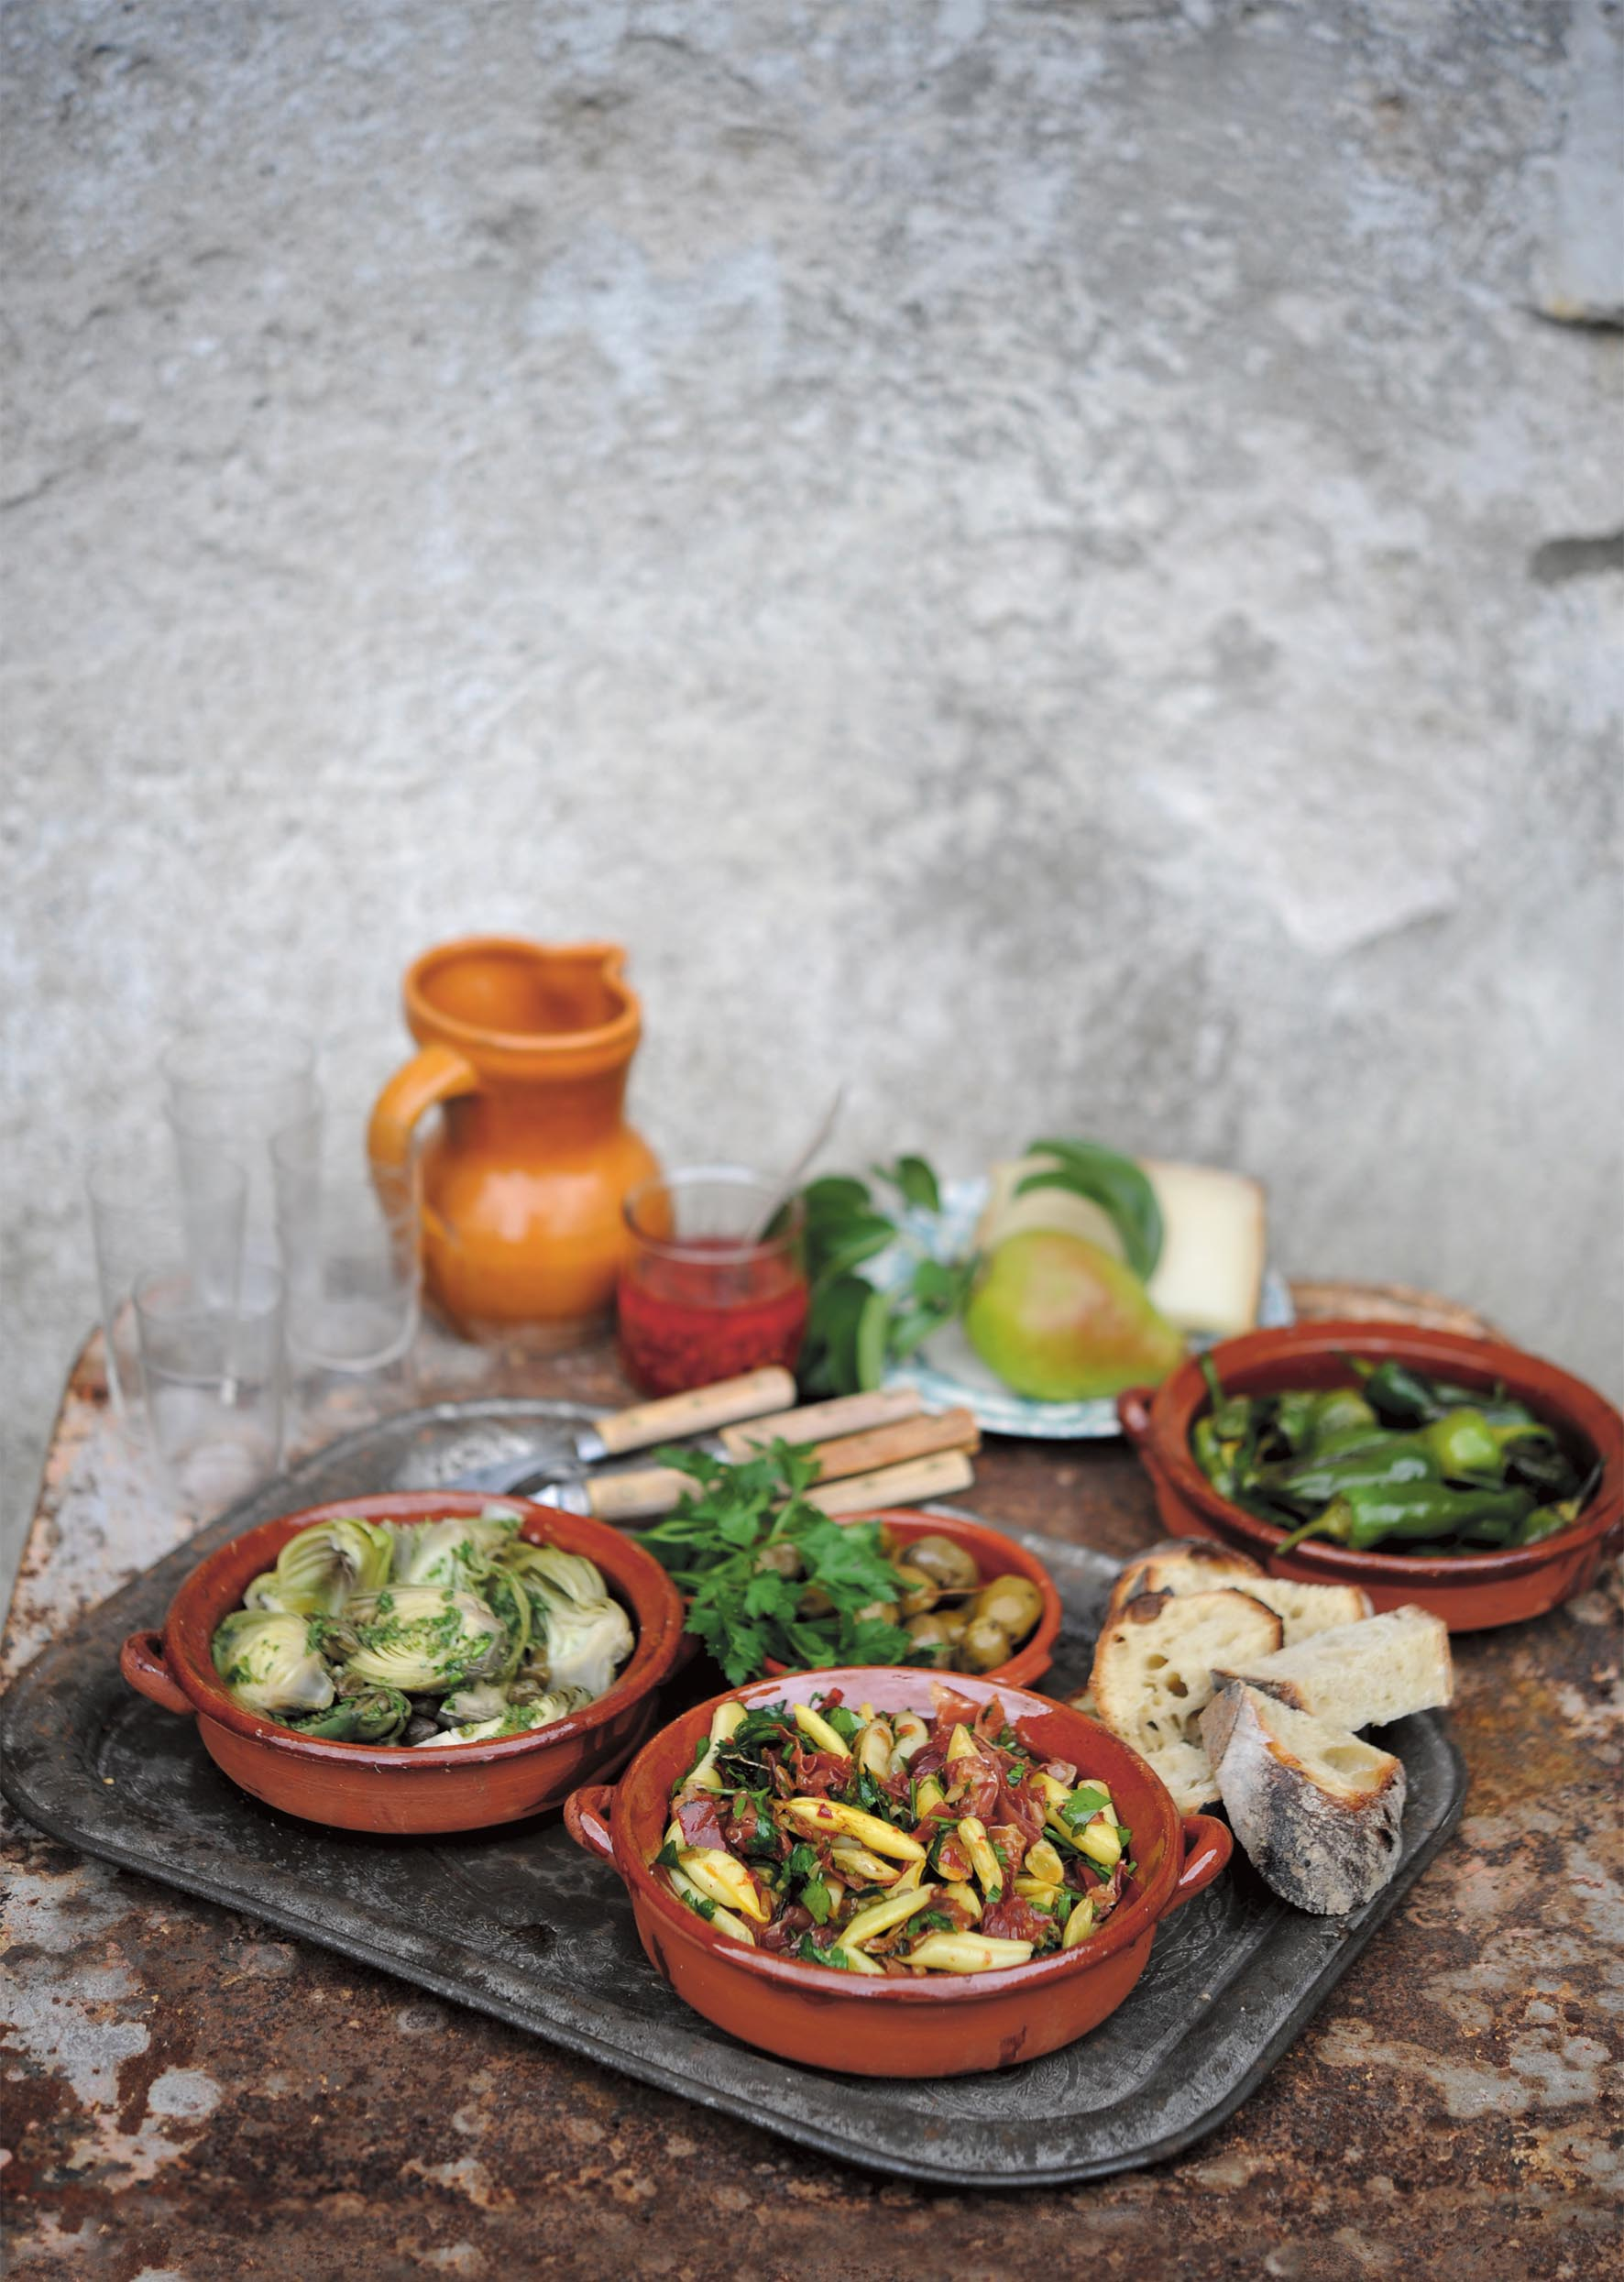 sommarmat med bergenströms recept